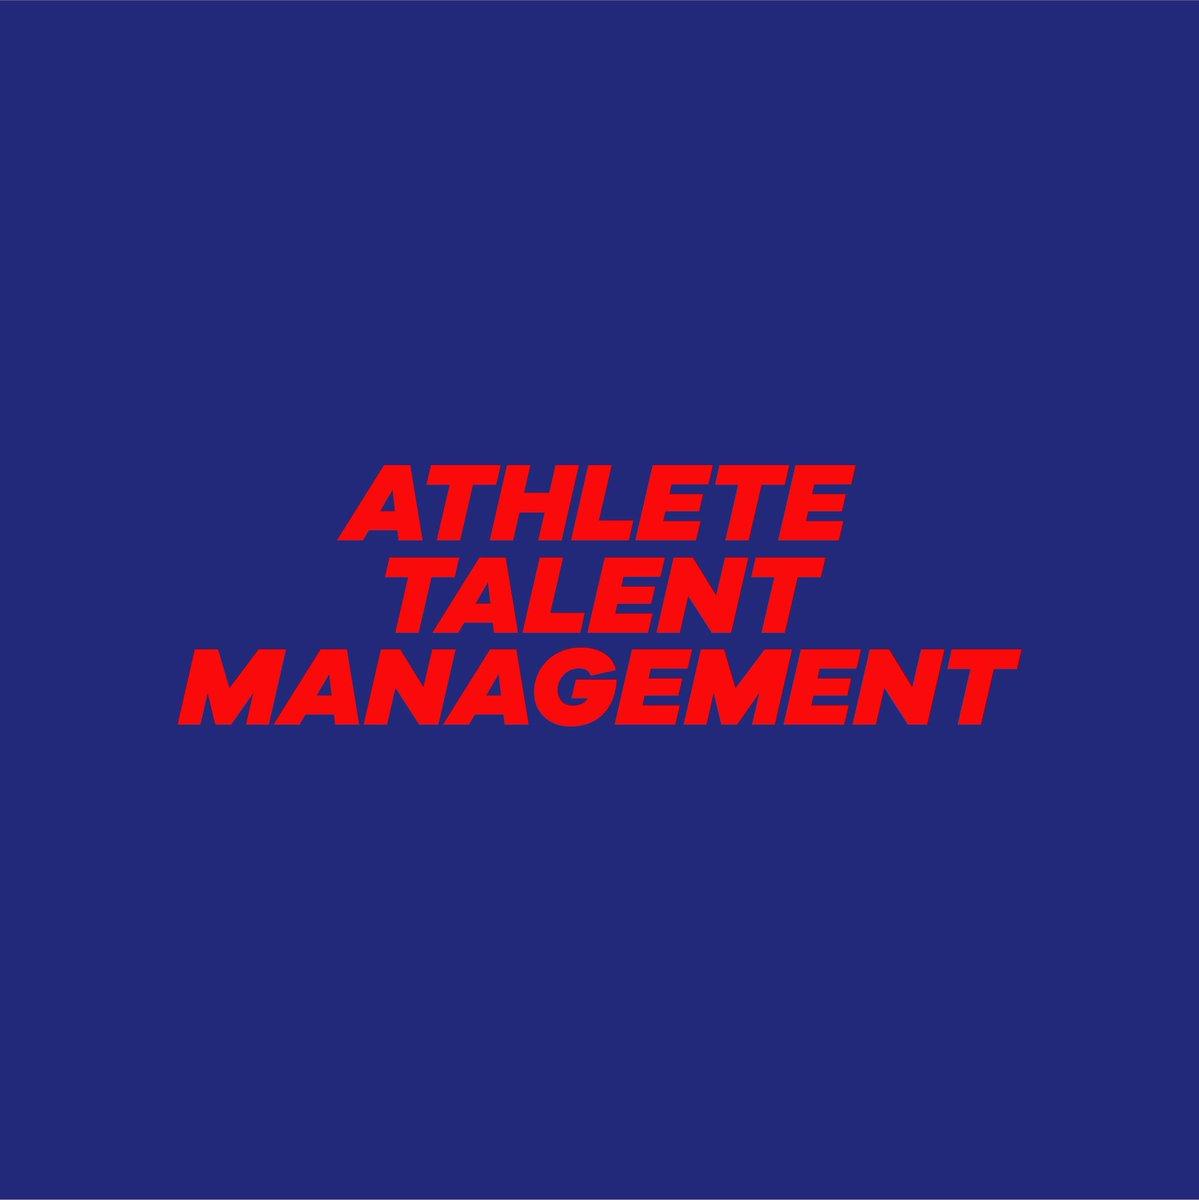 Under our Athlete Talent Management division, we manage exclusively a robust roster of six cricketers – @ImRo45, @hardikpandya7, @Jaspritbumrah93, @SDhawan25, @ShreyasIyer15 & @krunalpandya24 🤩  #RiseAsOne